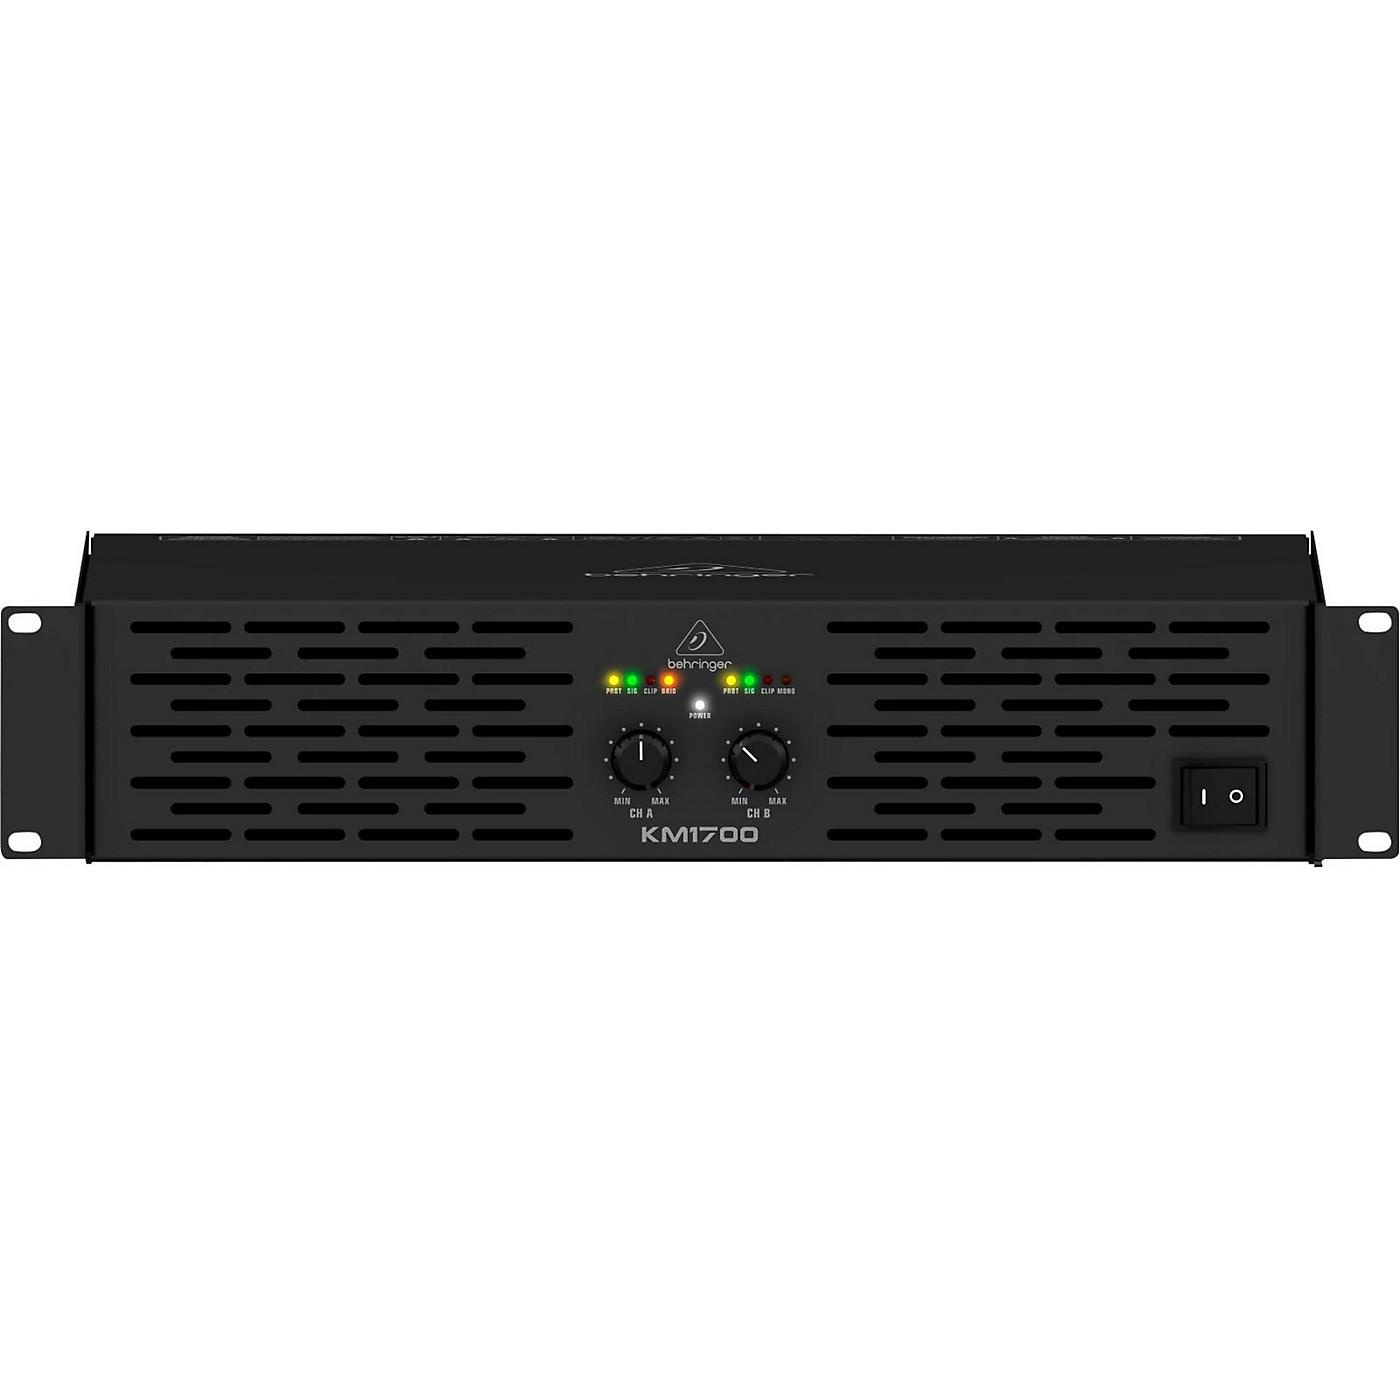 Behringer KM1700 Professional 1700-Watt Stereo Power Amplifier with ATR thumbnail